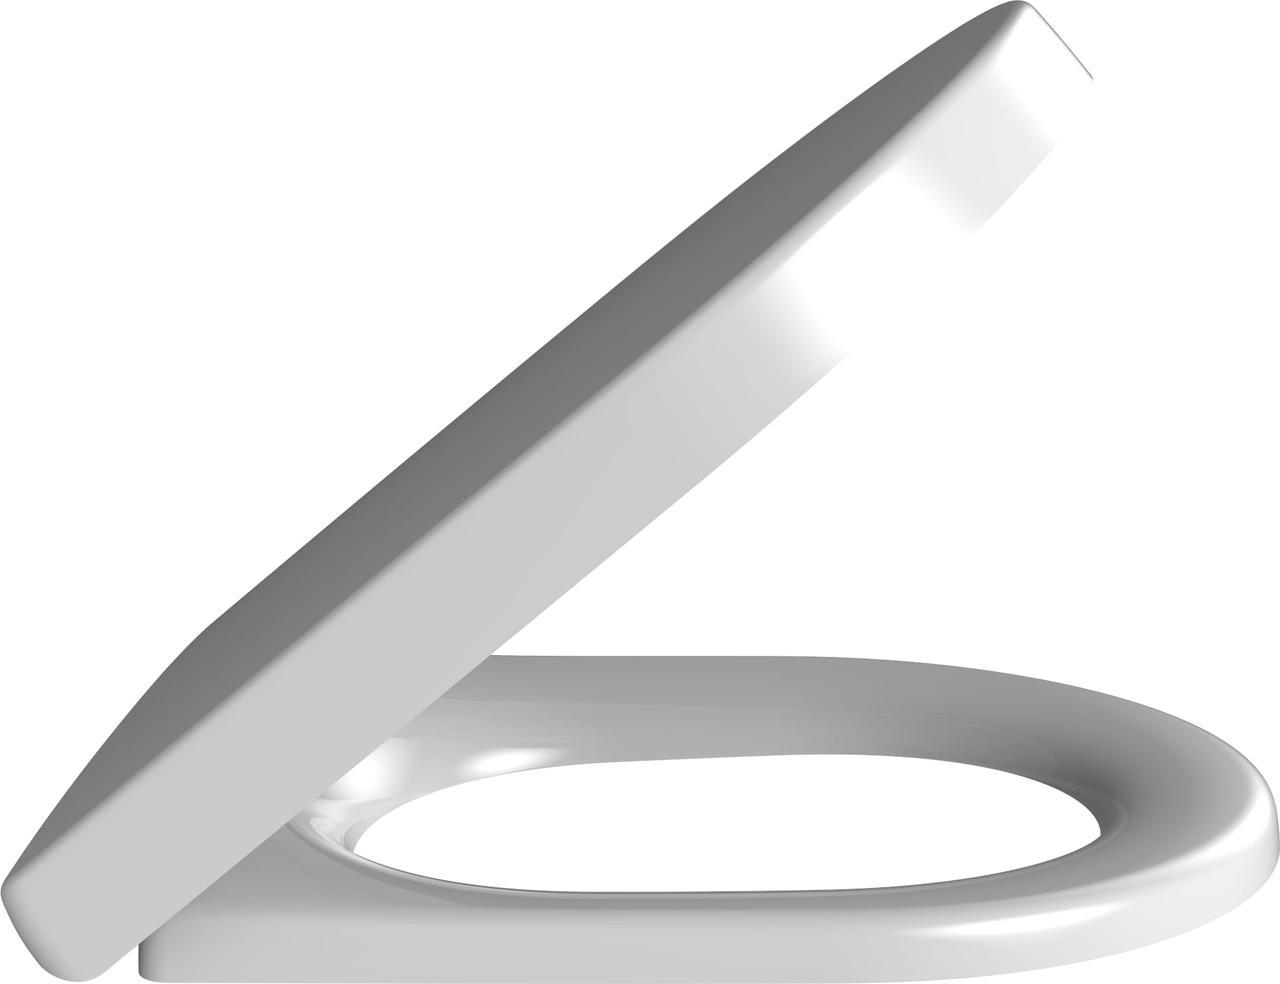 98M9C101 Omnia Architectura WC-Cидіння з кришкою з Quick Release and Soft Closing кріплення